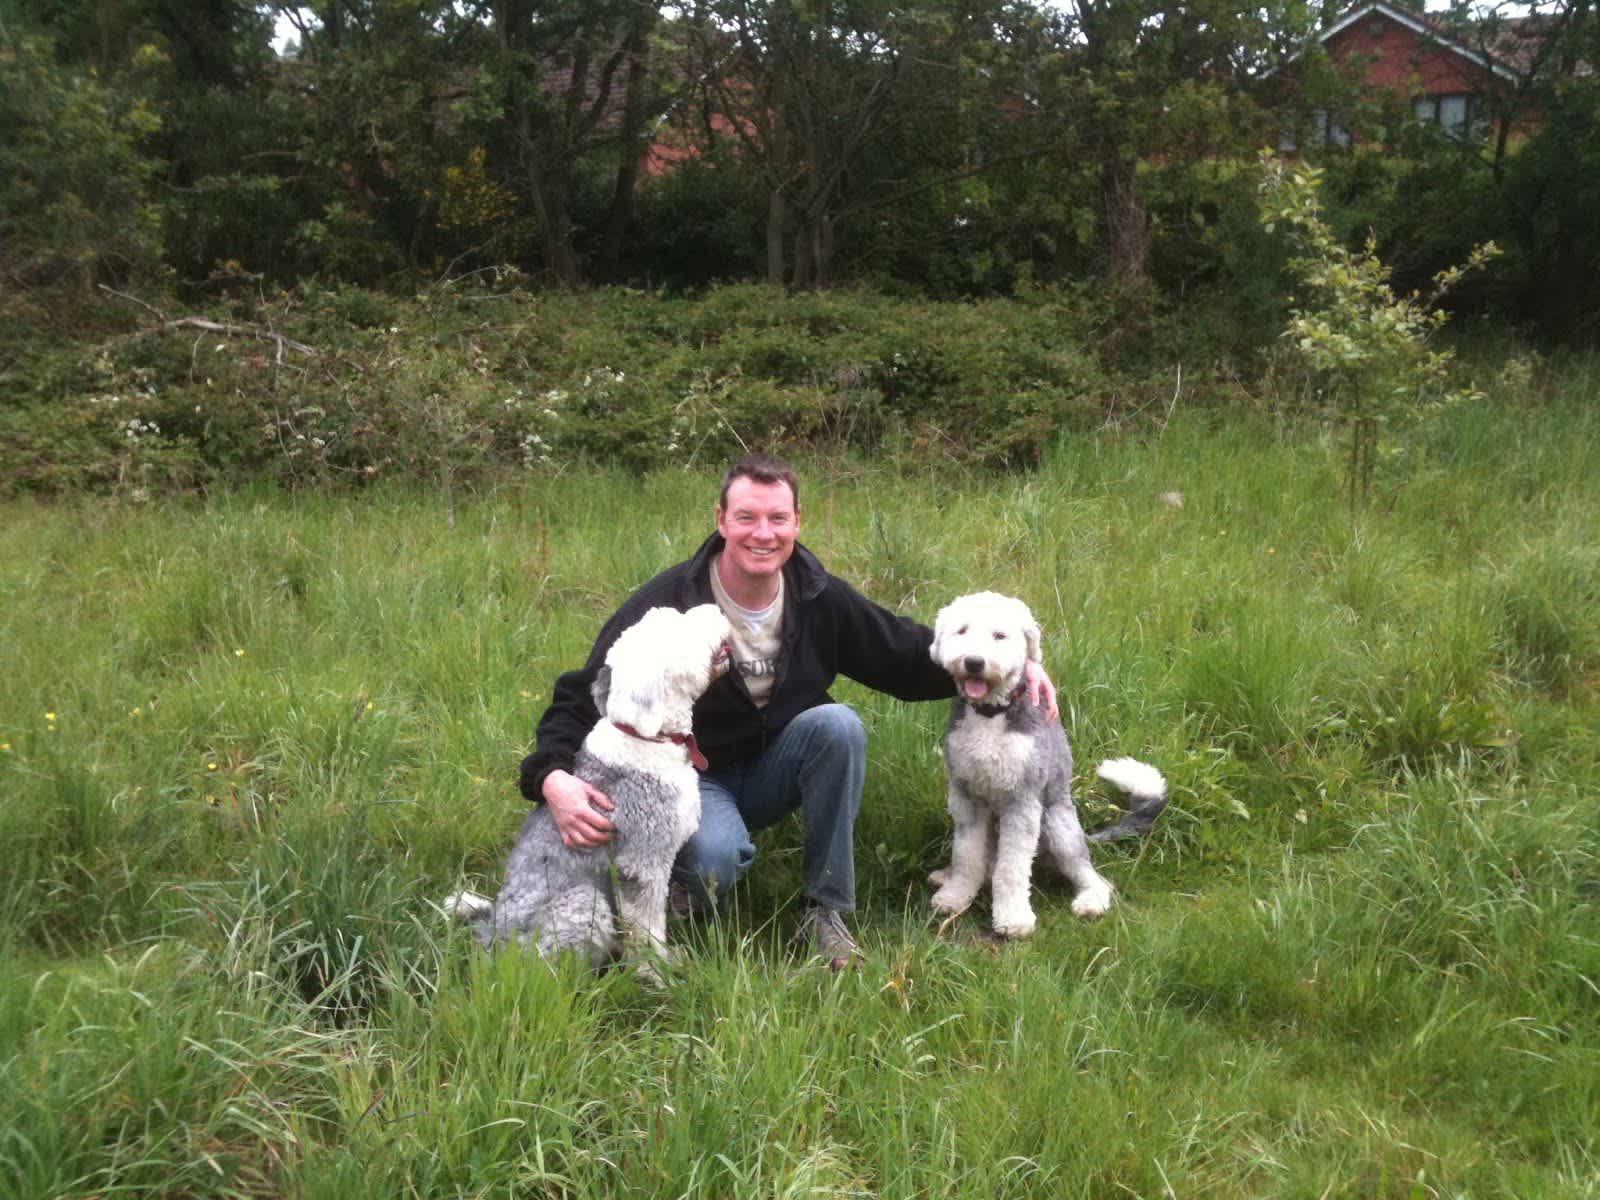 Steven from Sutton Coldfield, United Kingdom